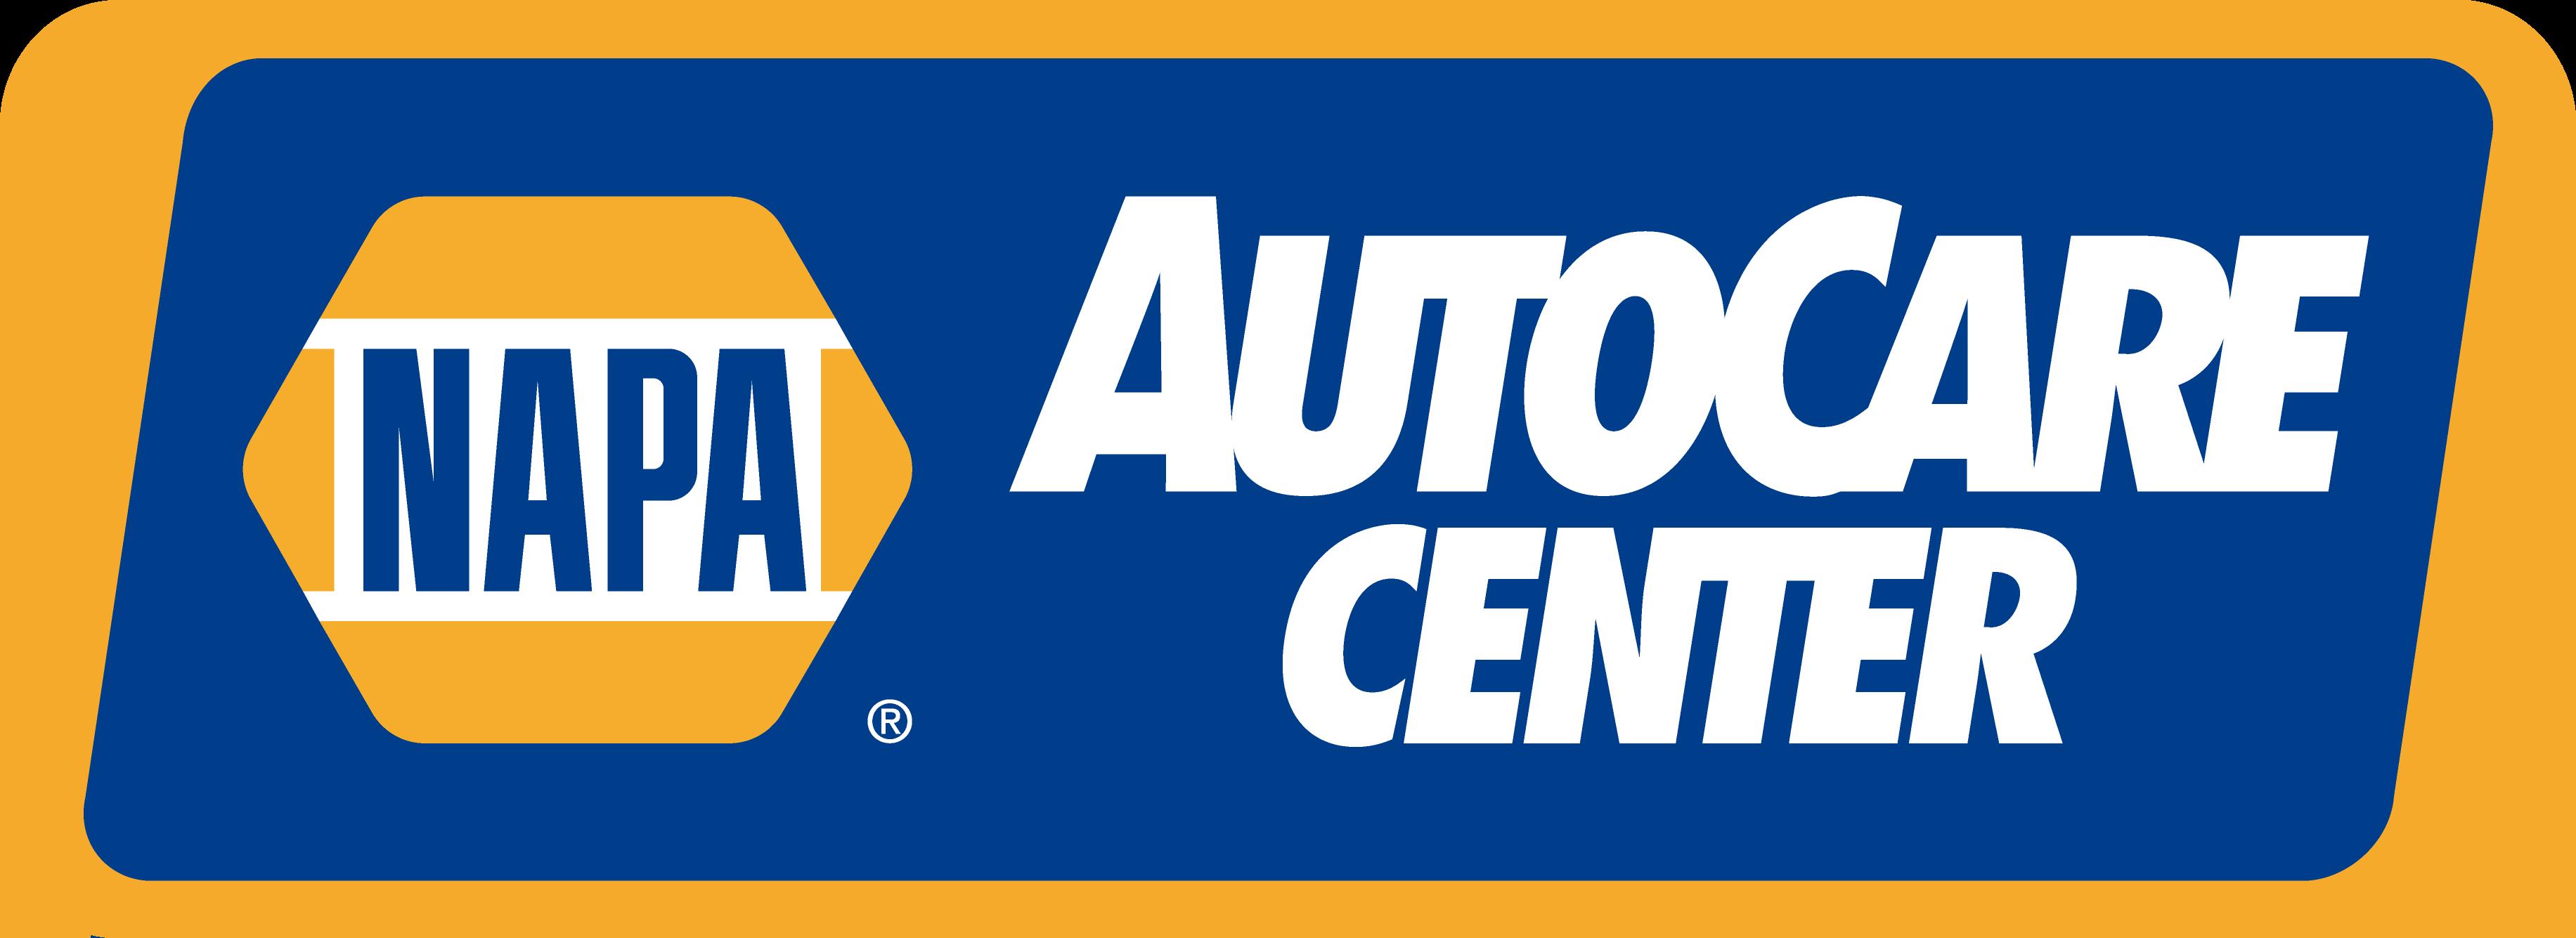 Napa Auto Care Center, Antioch Napa Auto Care, Antioch, Ca, Hdpng.com  - Auto Brake Service, Transparent background PNG HD thumbnail